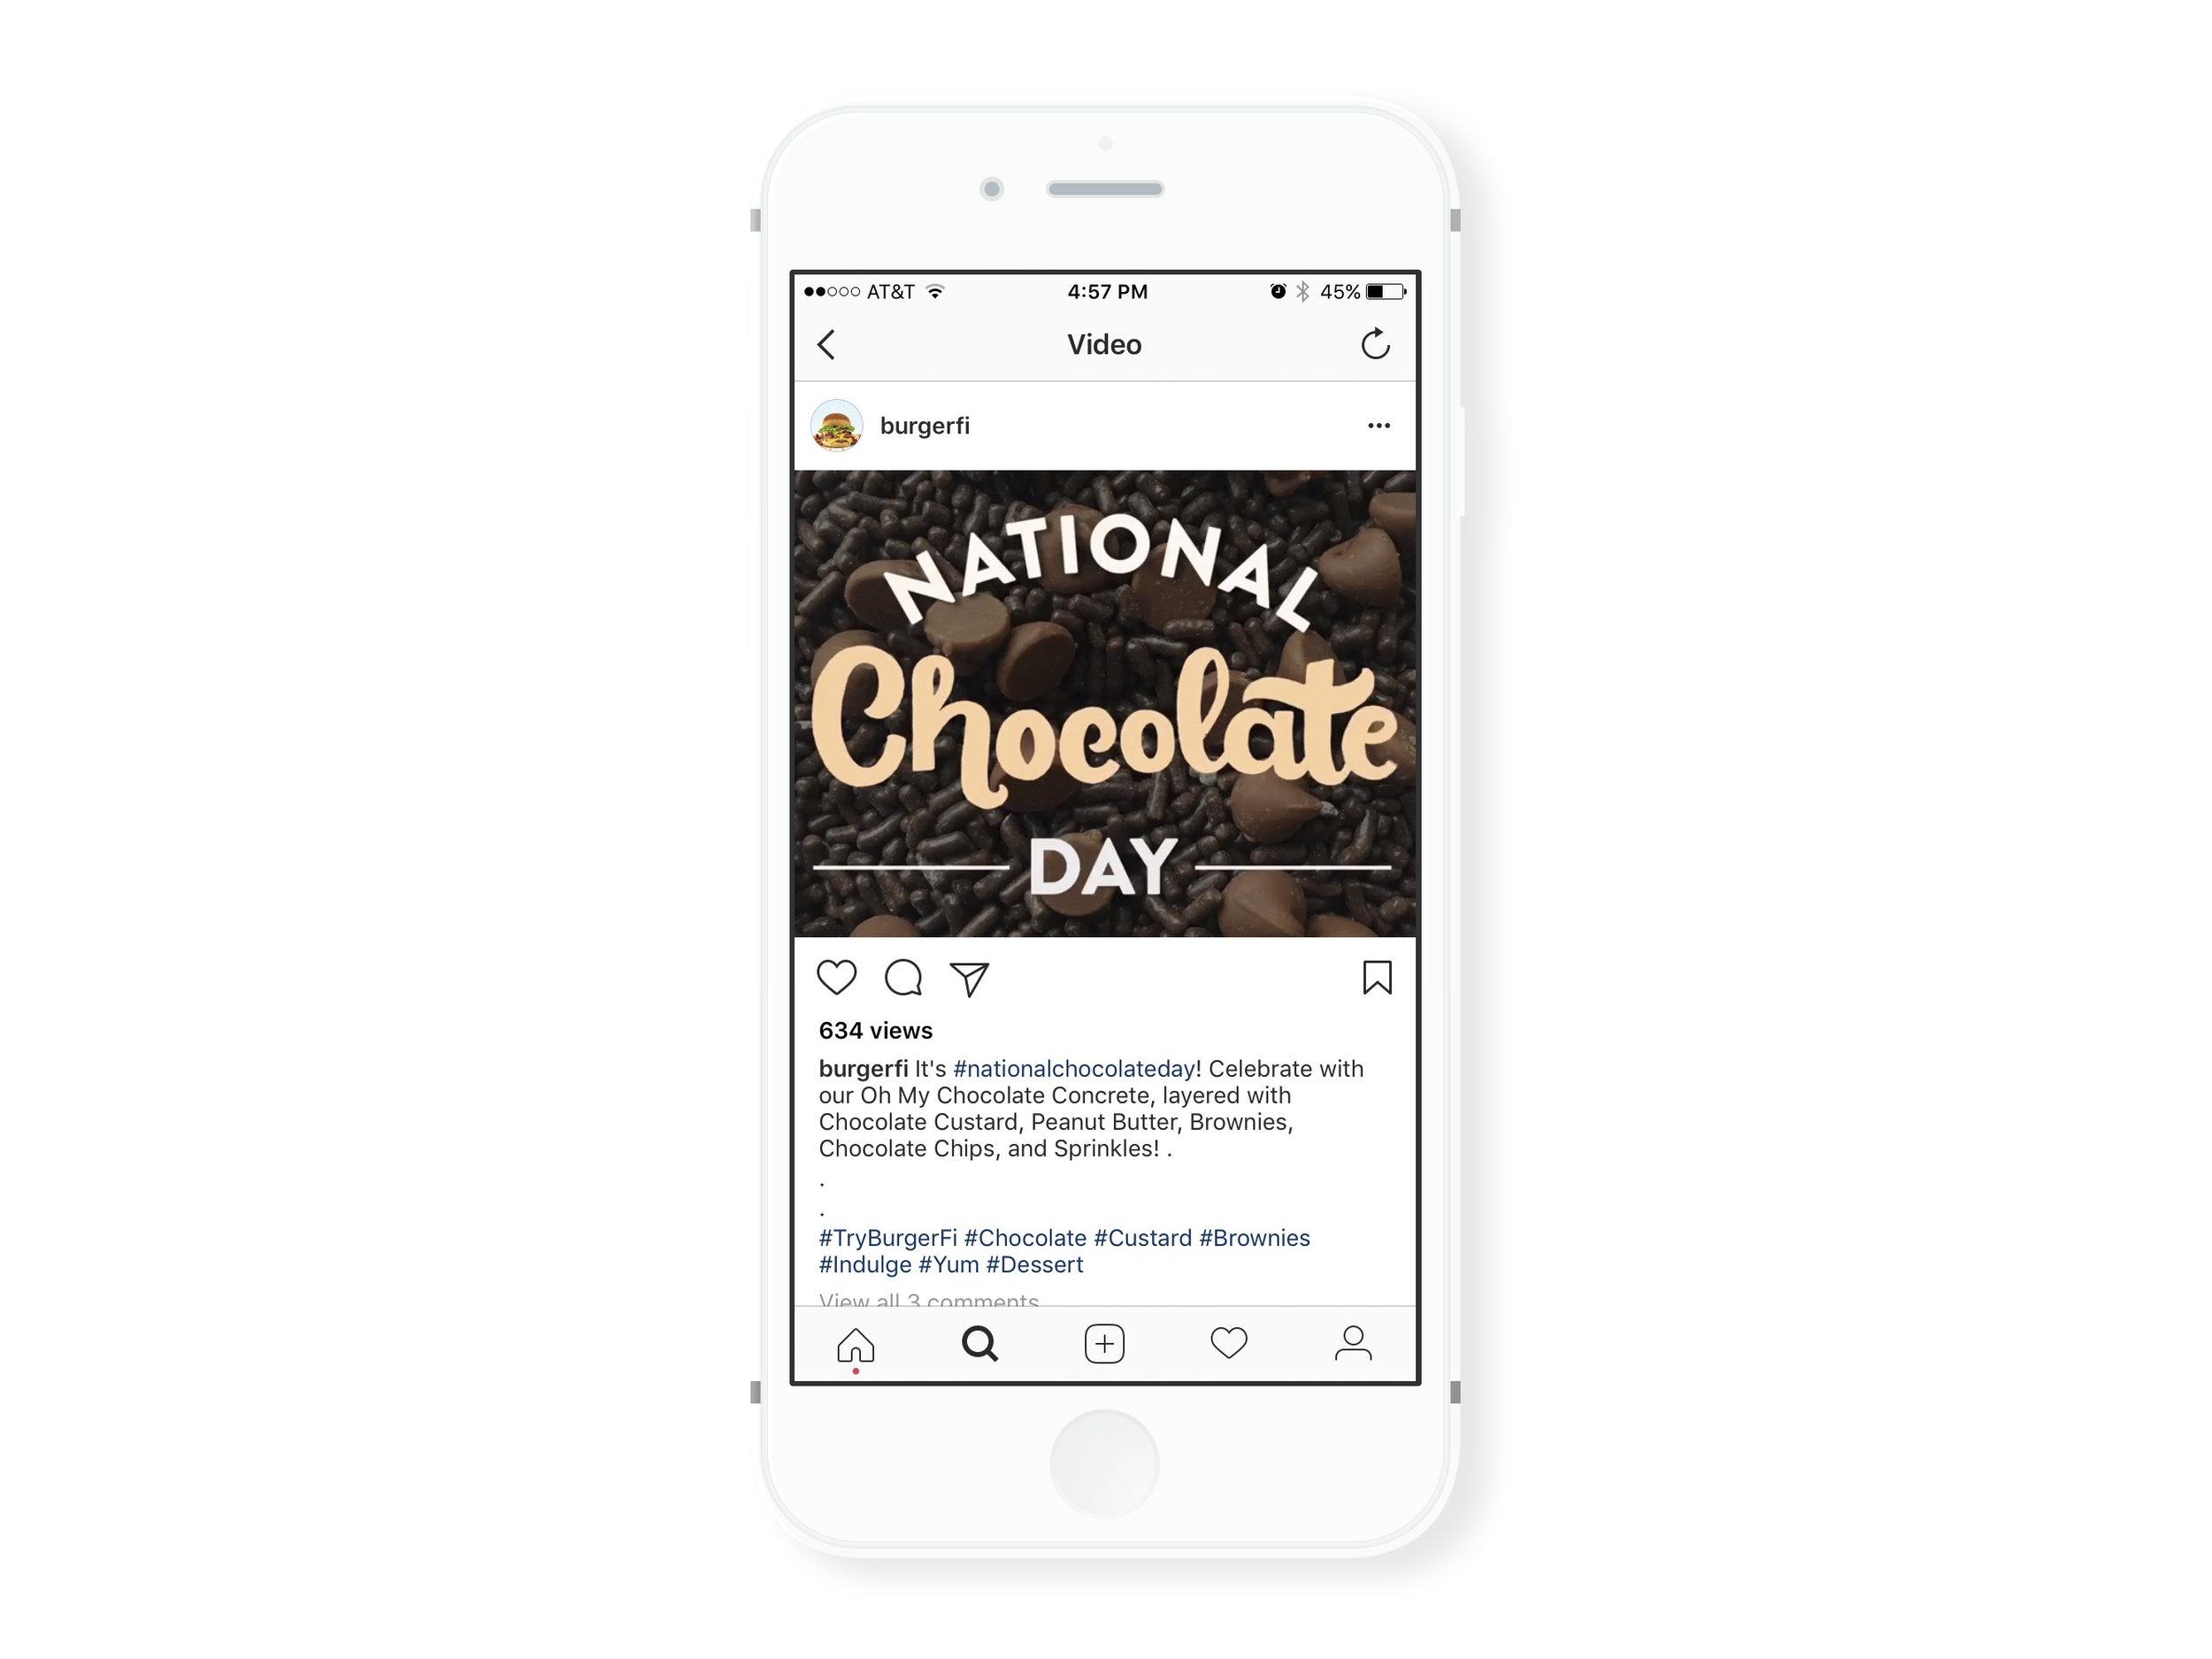 BFI_Social-Media_Chocolate.jpg